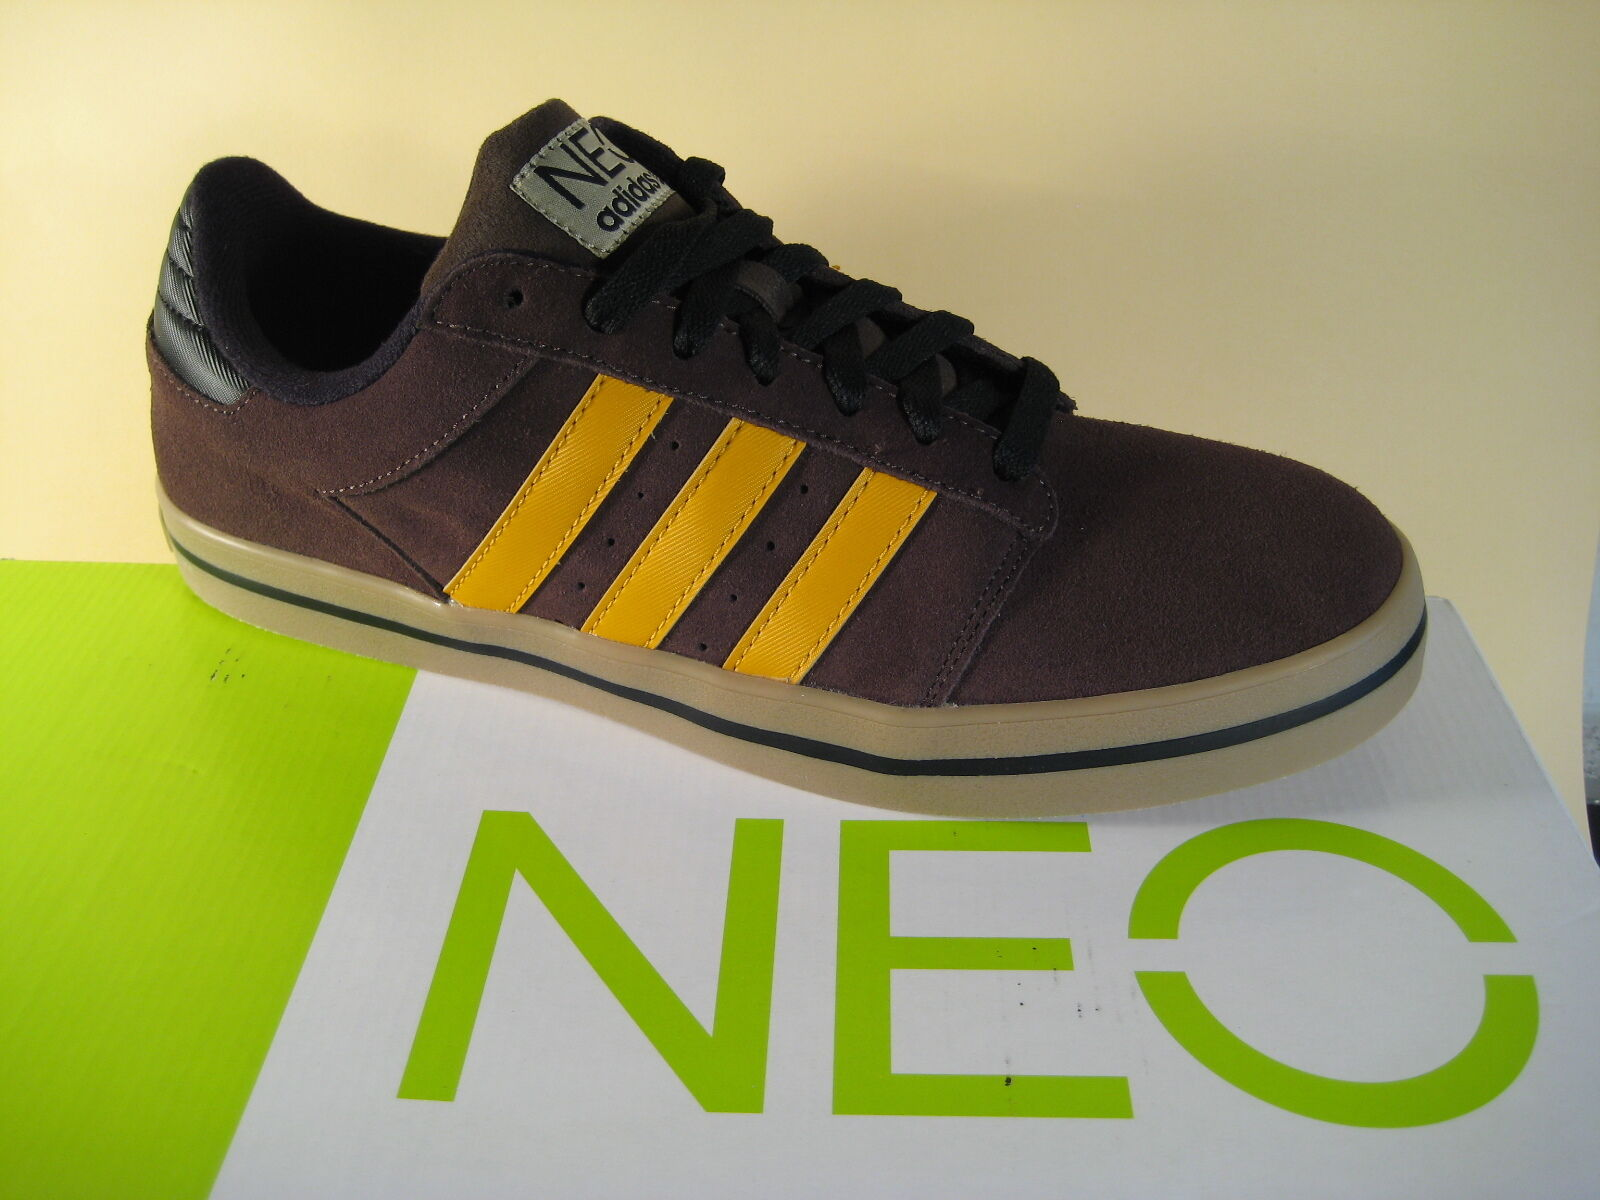 Adidas NEO Groula SK braun/gelb Echtleder  Neu!